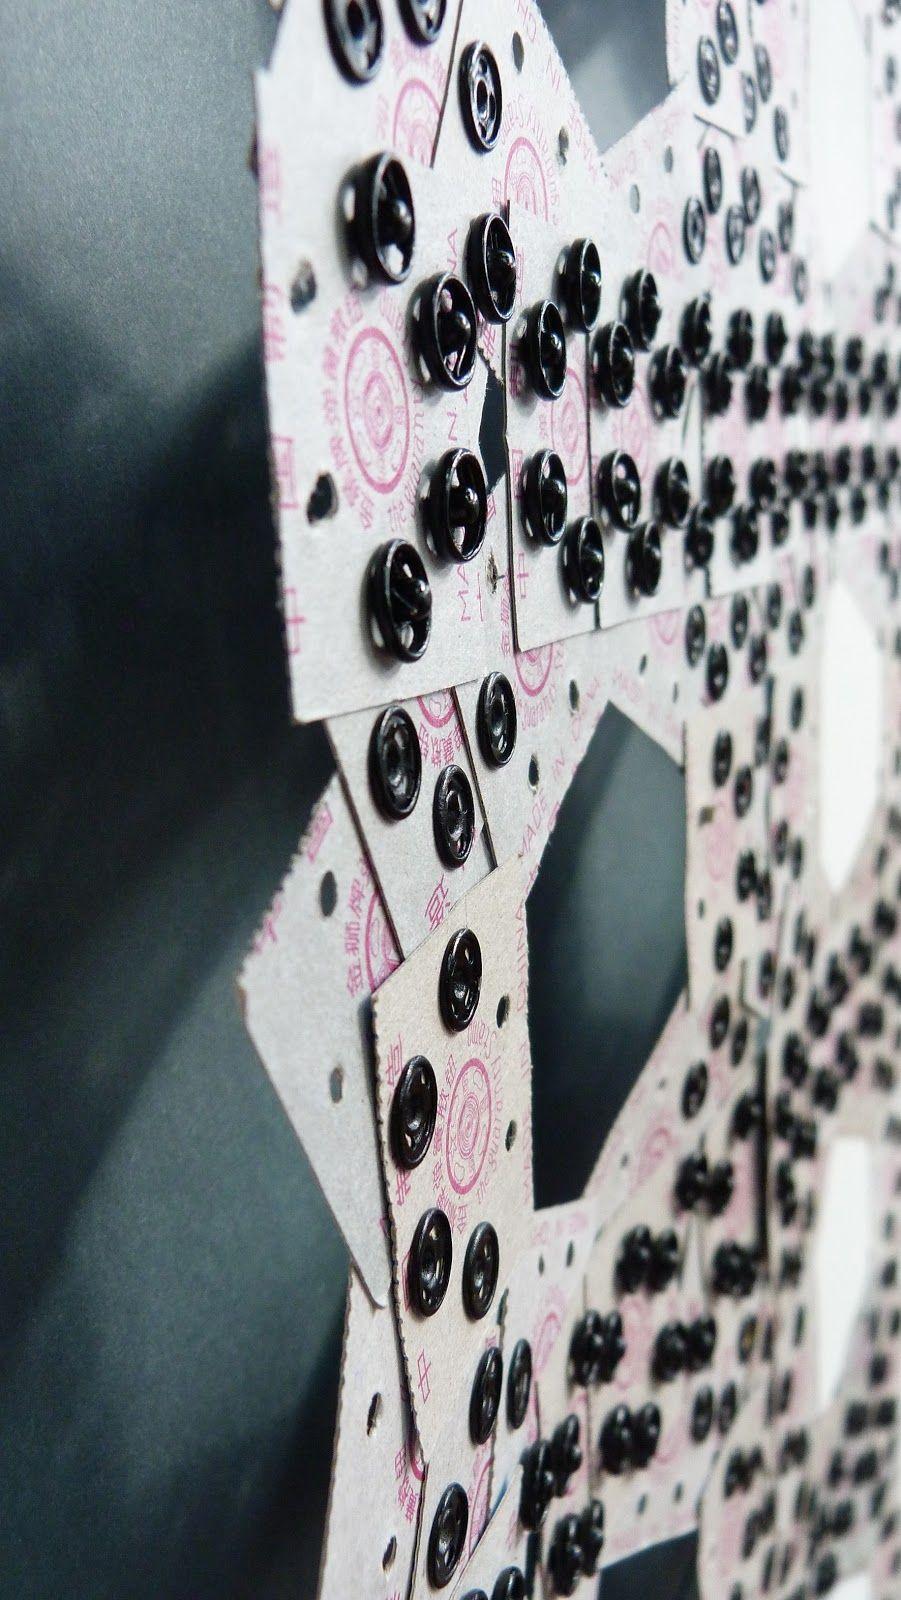 Reconstrucción Made in Chile / Papel y Broches / Paper and Snap Buttons  Josefa Espinosa  2012